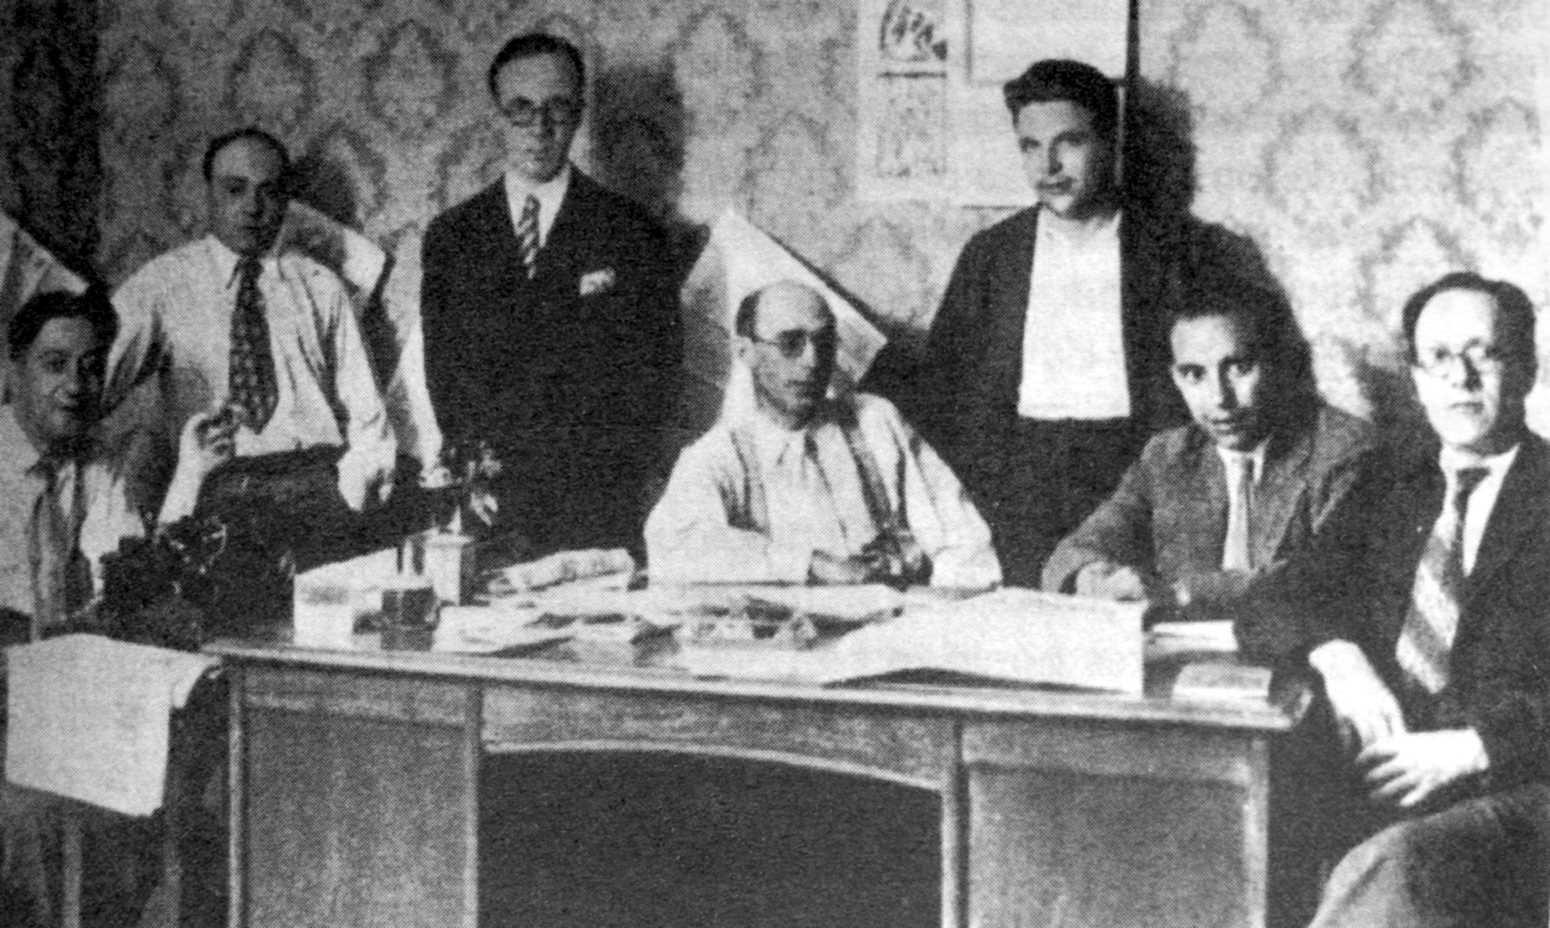 Nova redacció de «Solidaridad Obrera» (1923). D'esquerra a dreta: Arturo Parera Malí, Fernando Pintado, Muñoz, Liberto Callejas, Manuel Ribas, Vicente Galindo Cortés («Fontaura») i Miguel Terrén Mañero